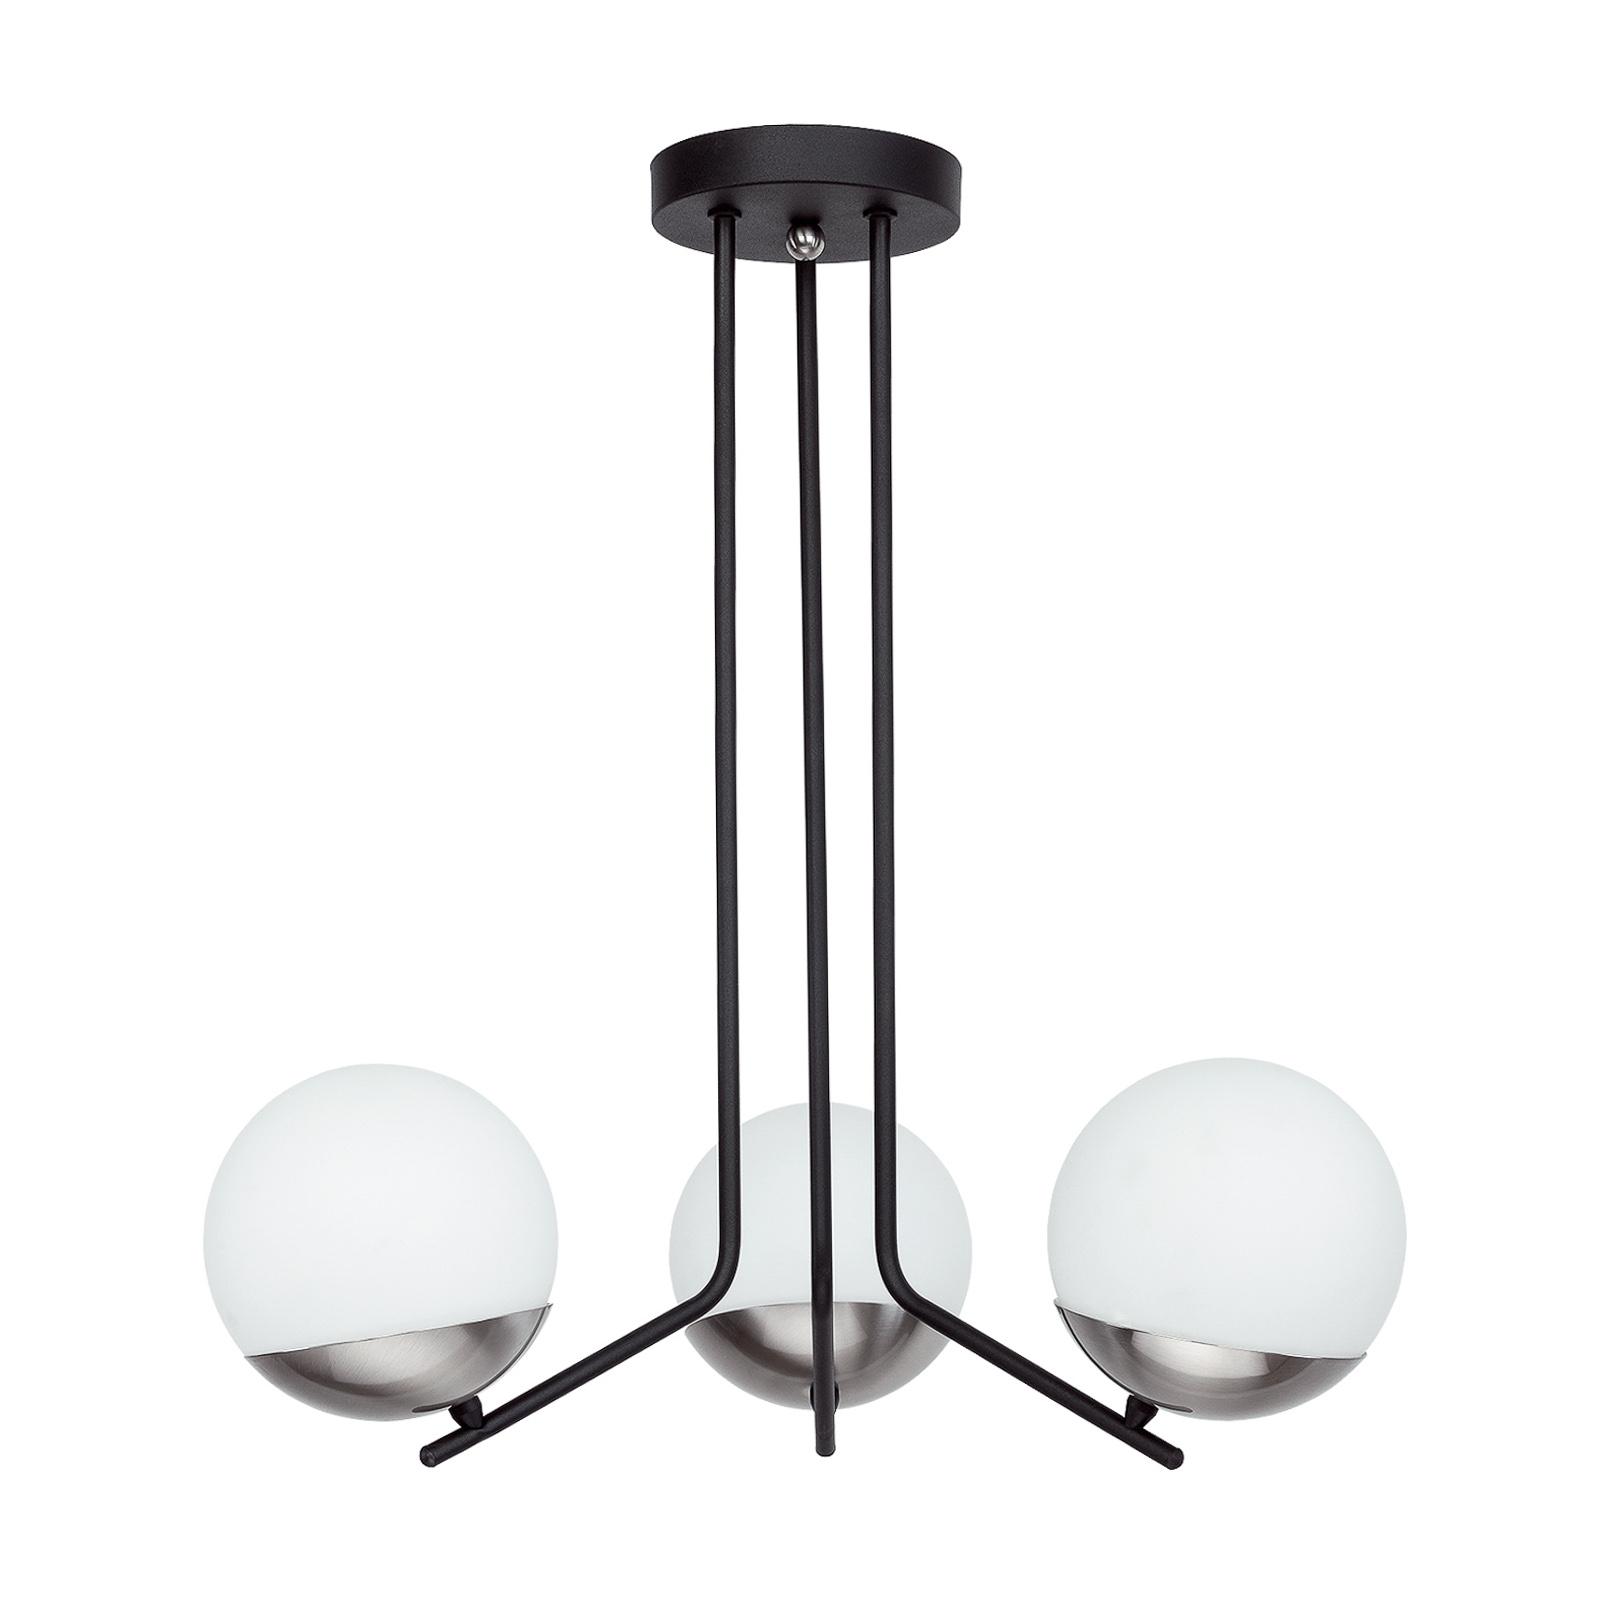 Suspension Torbole, opale/nickel, à 3 lampes